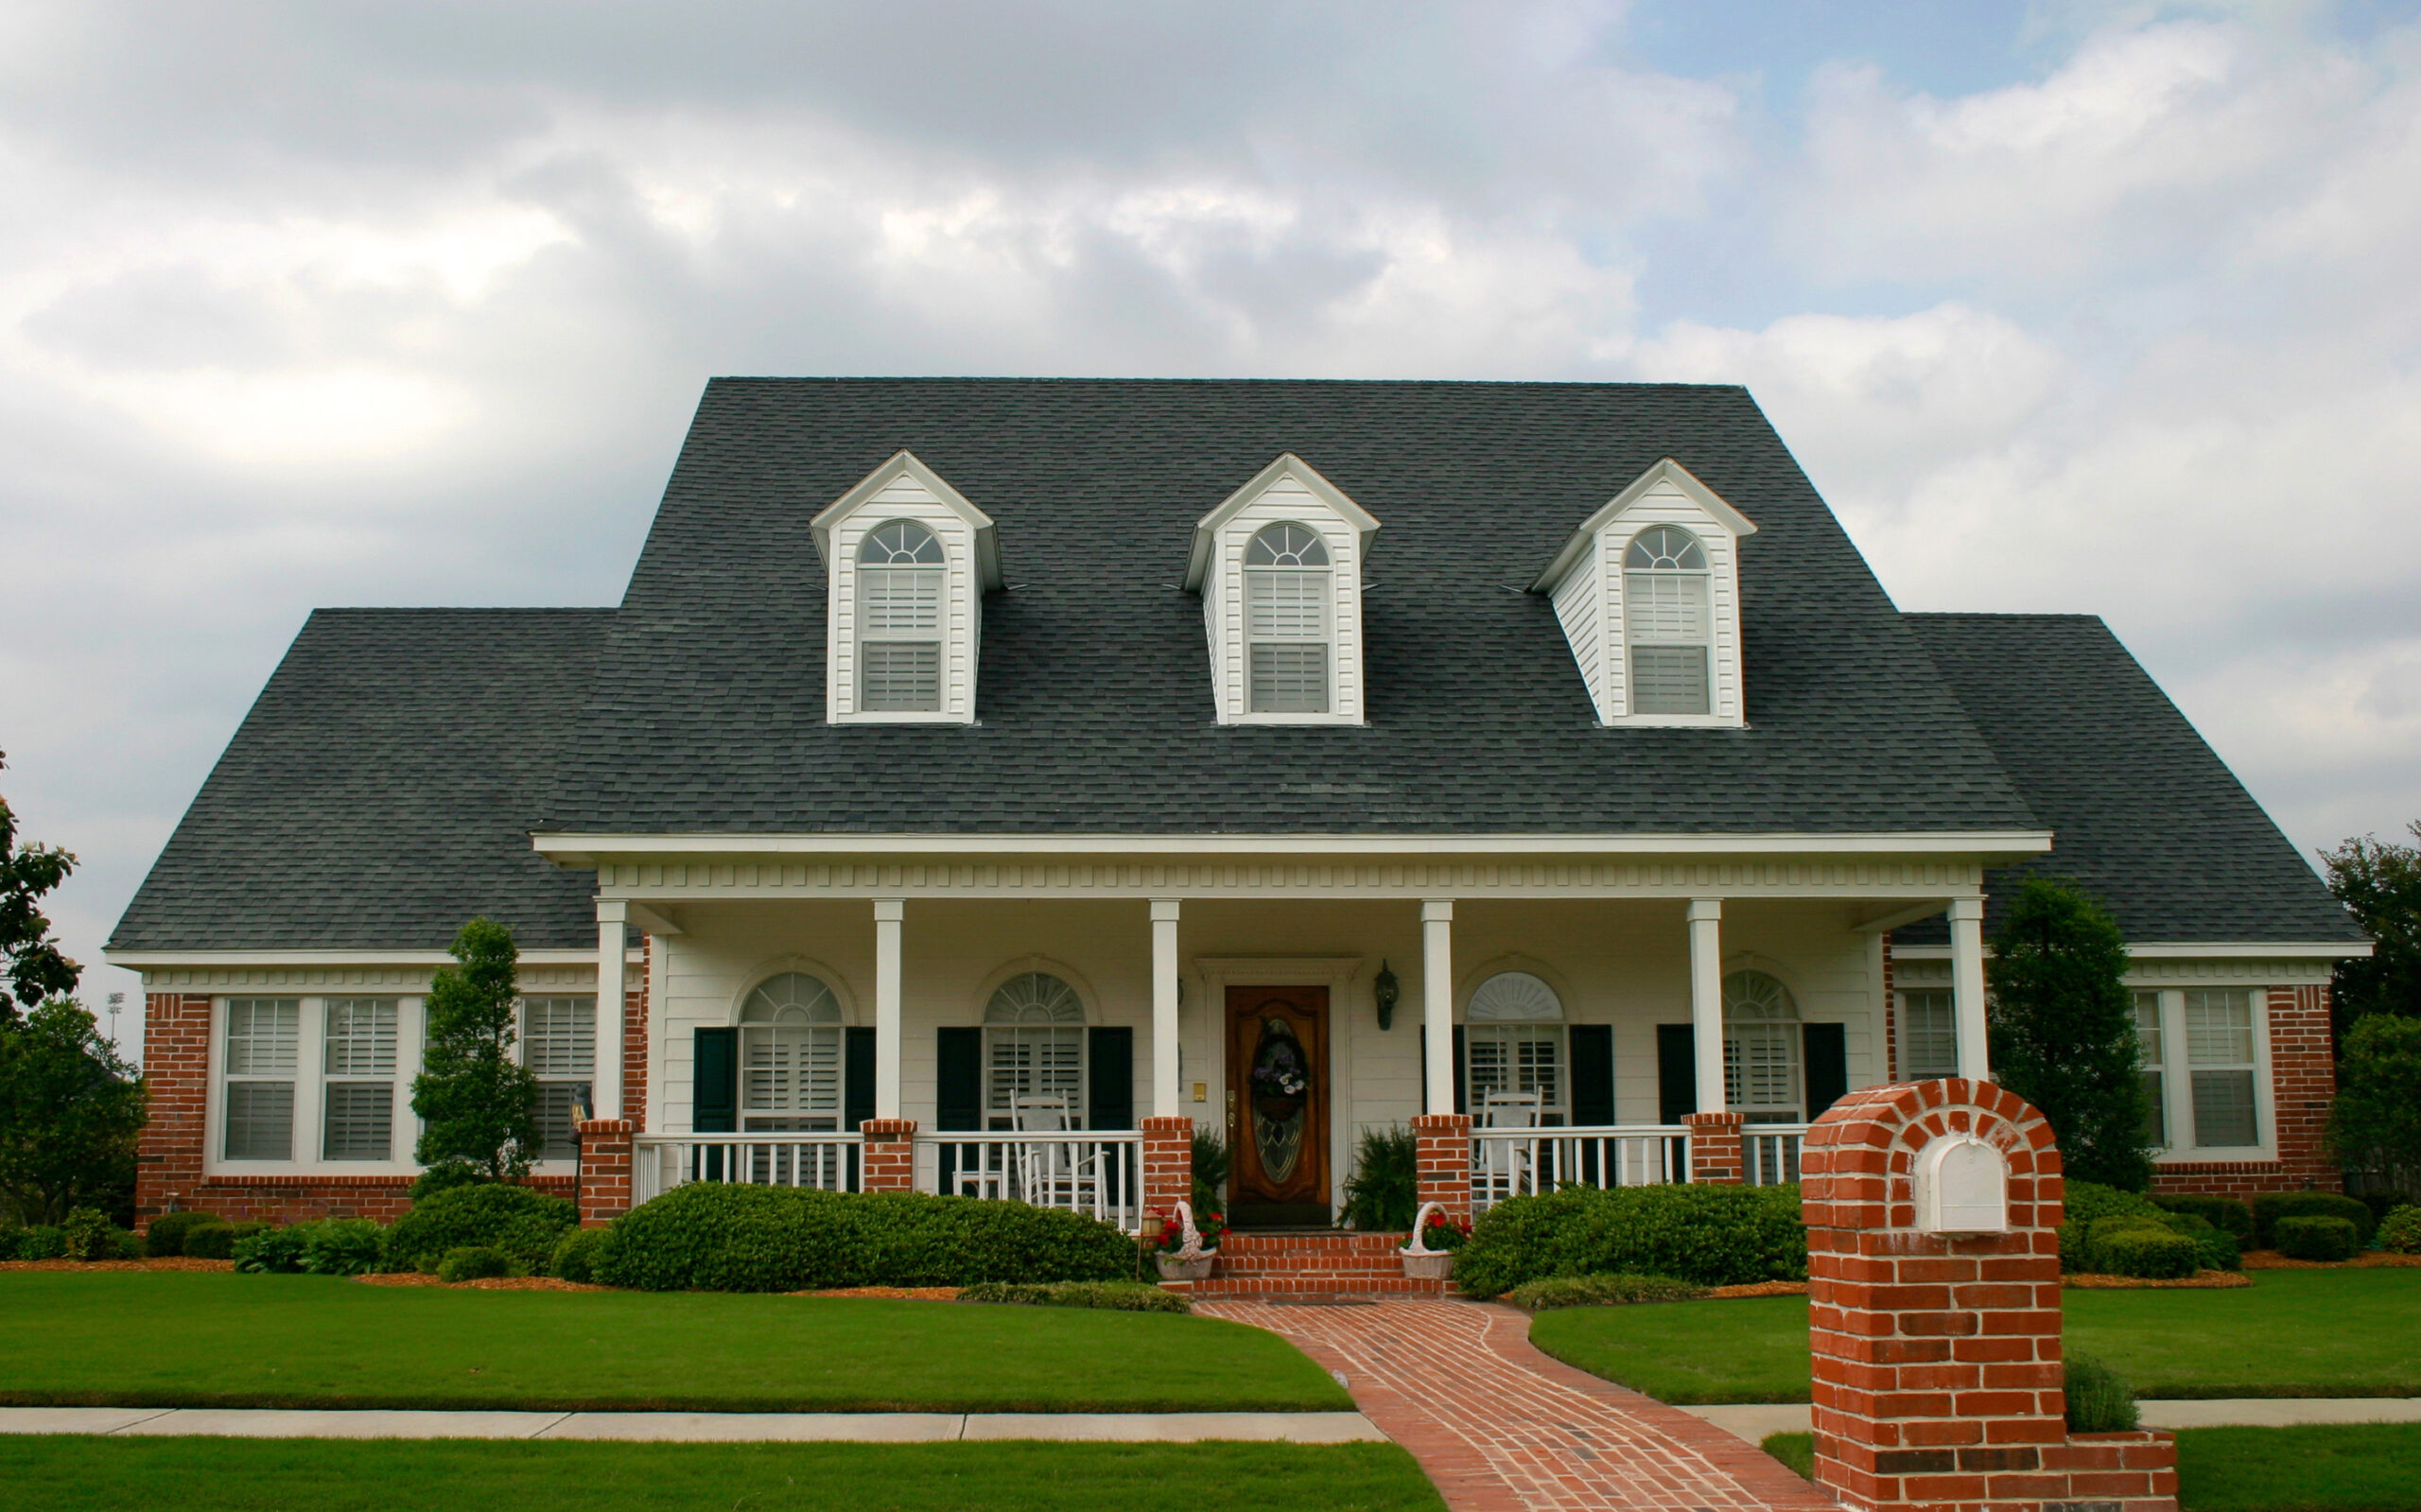 Clean Asphalt Roof on House